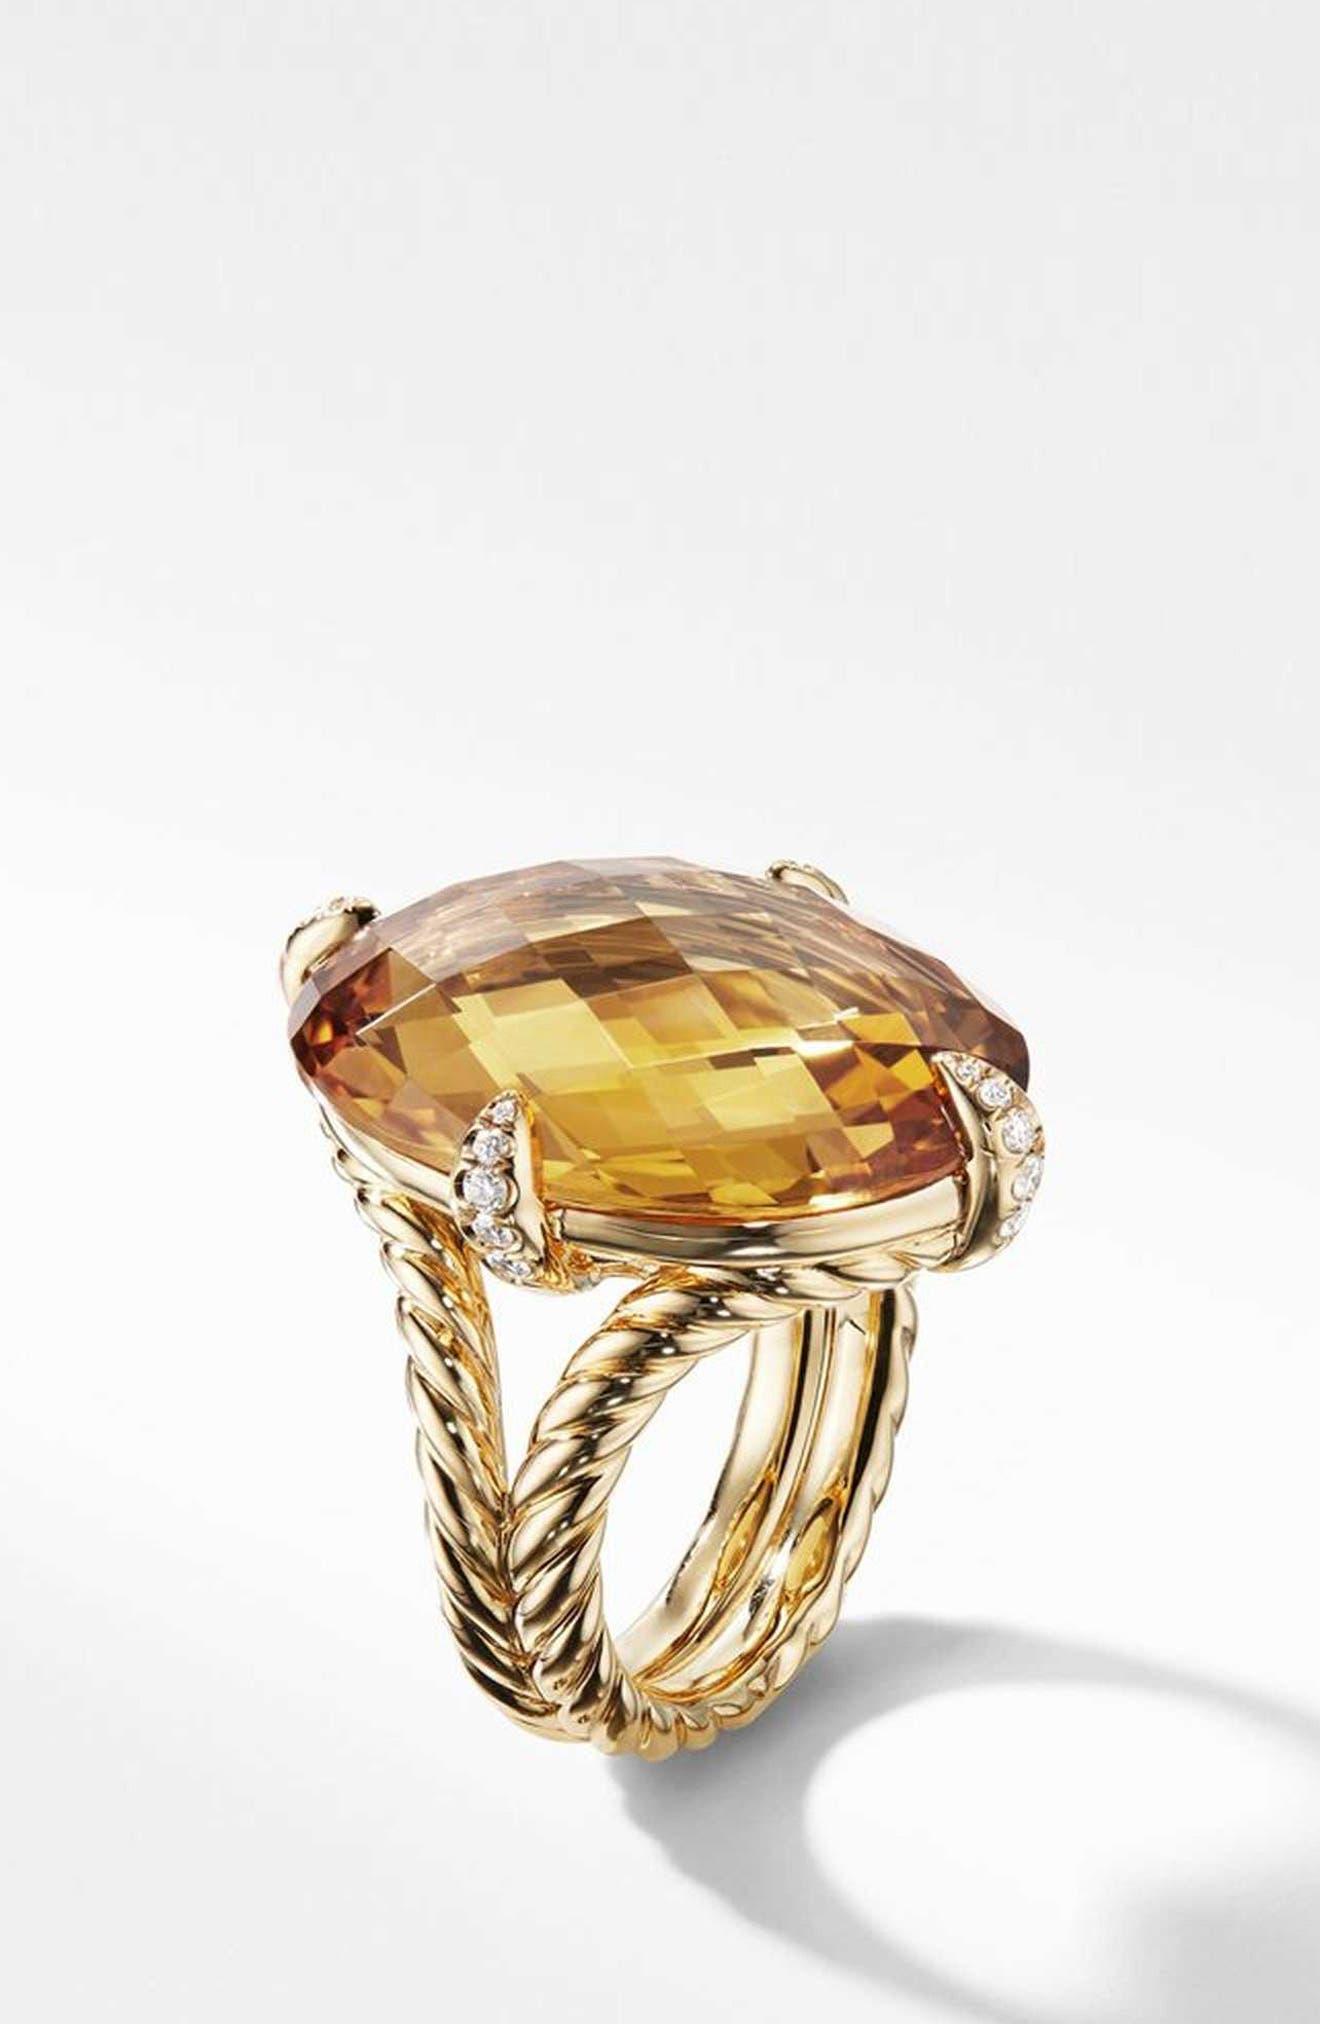 Chatelaine<sup>®</sup> 18k Gold Statement Ring with Honey Quartz & Diamonds,                             Alternate thumbnail 2, color,                             GOLD/ DIAMOND/ HONEY QUARTZ